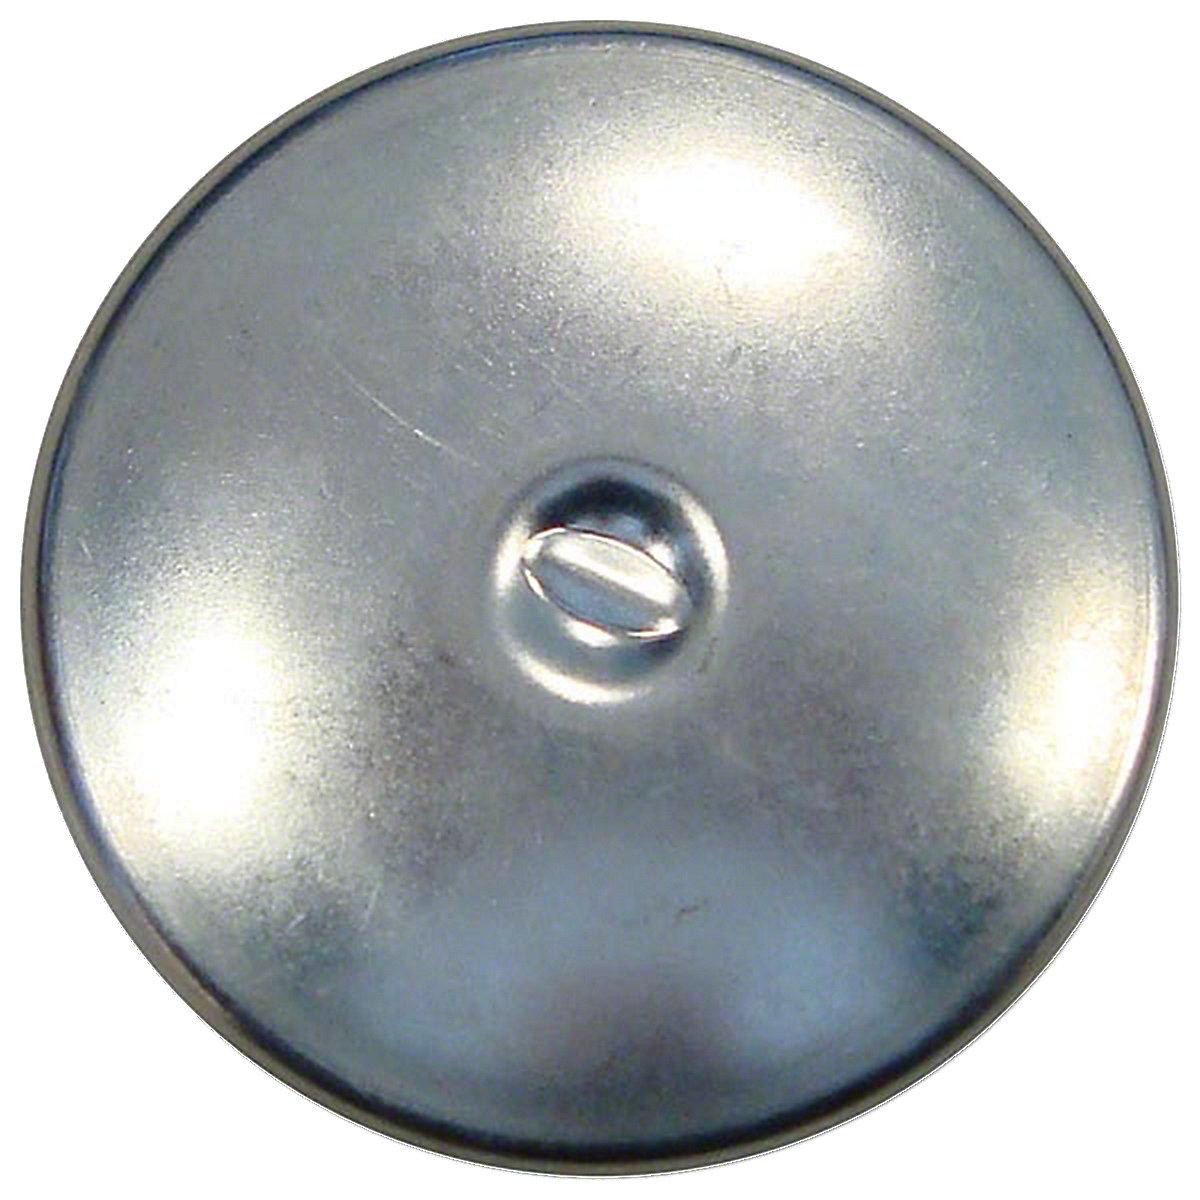 Fuel Cap With Gasket For Allis Chalmers: 190XT, D21, 190, 200, 210, 220, 7000, 7010, 7020, 7030, 7040, 7045, 7050, 7060, 7080, 7580, 8550.